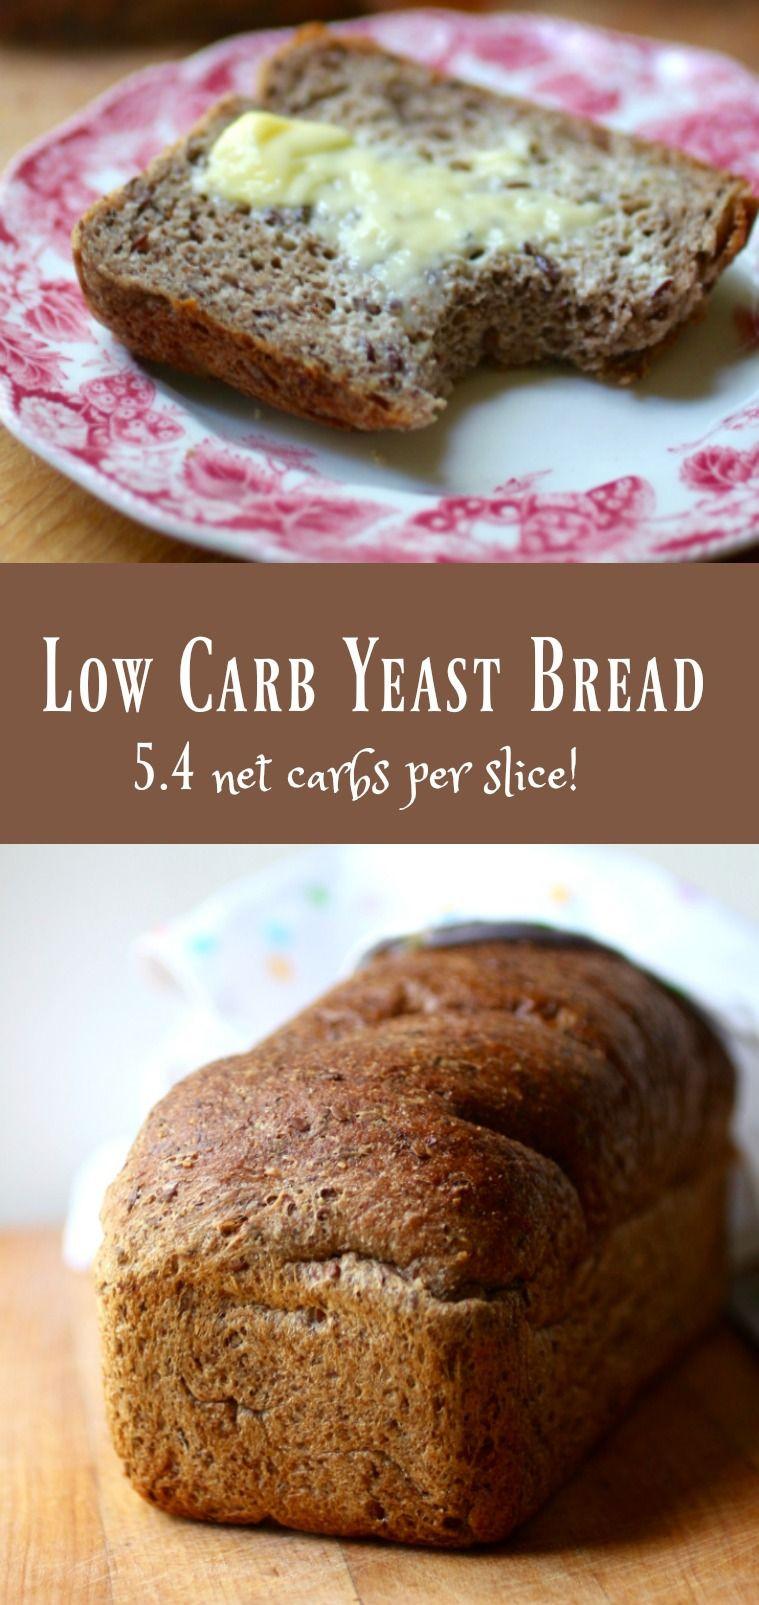 Atkins Low Carb Bread  Low Carb Yeast Bread Keto Sandwich Bread Recipe